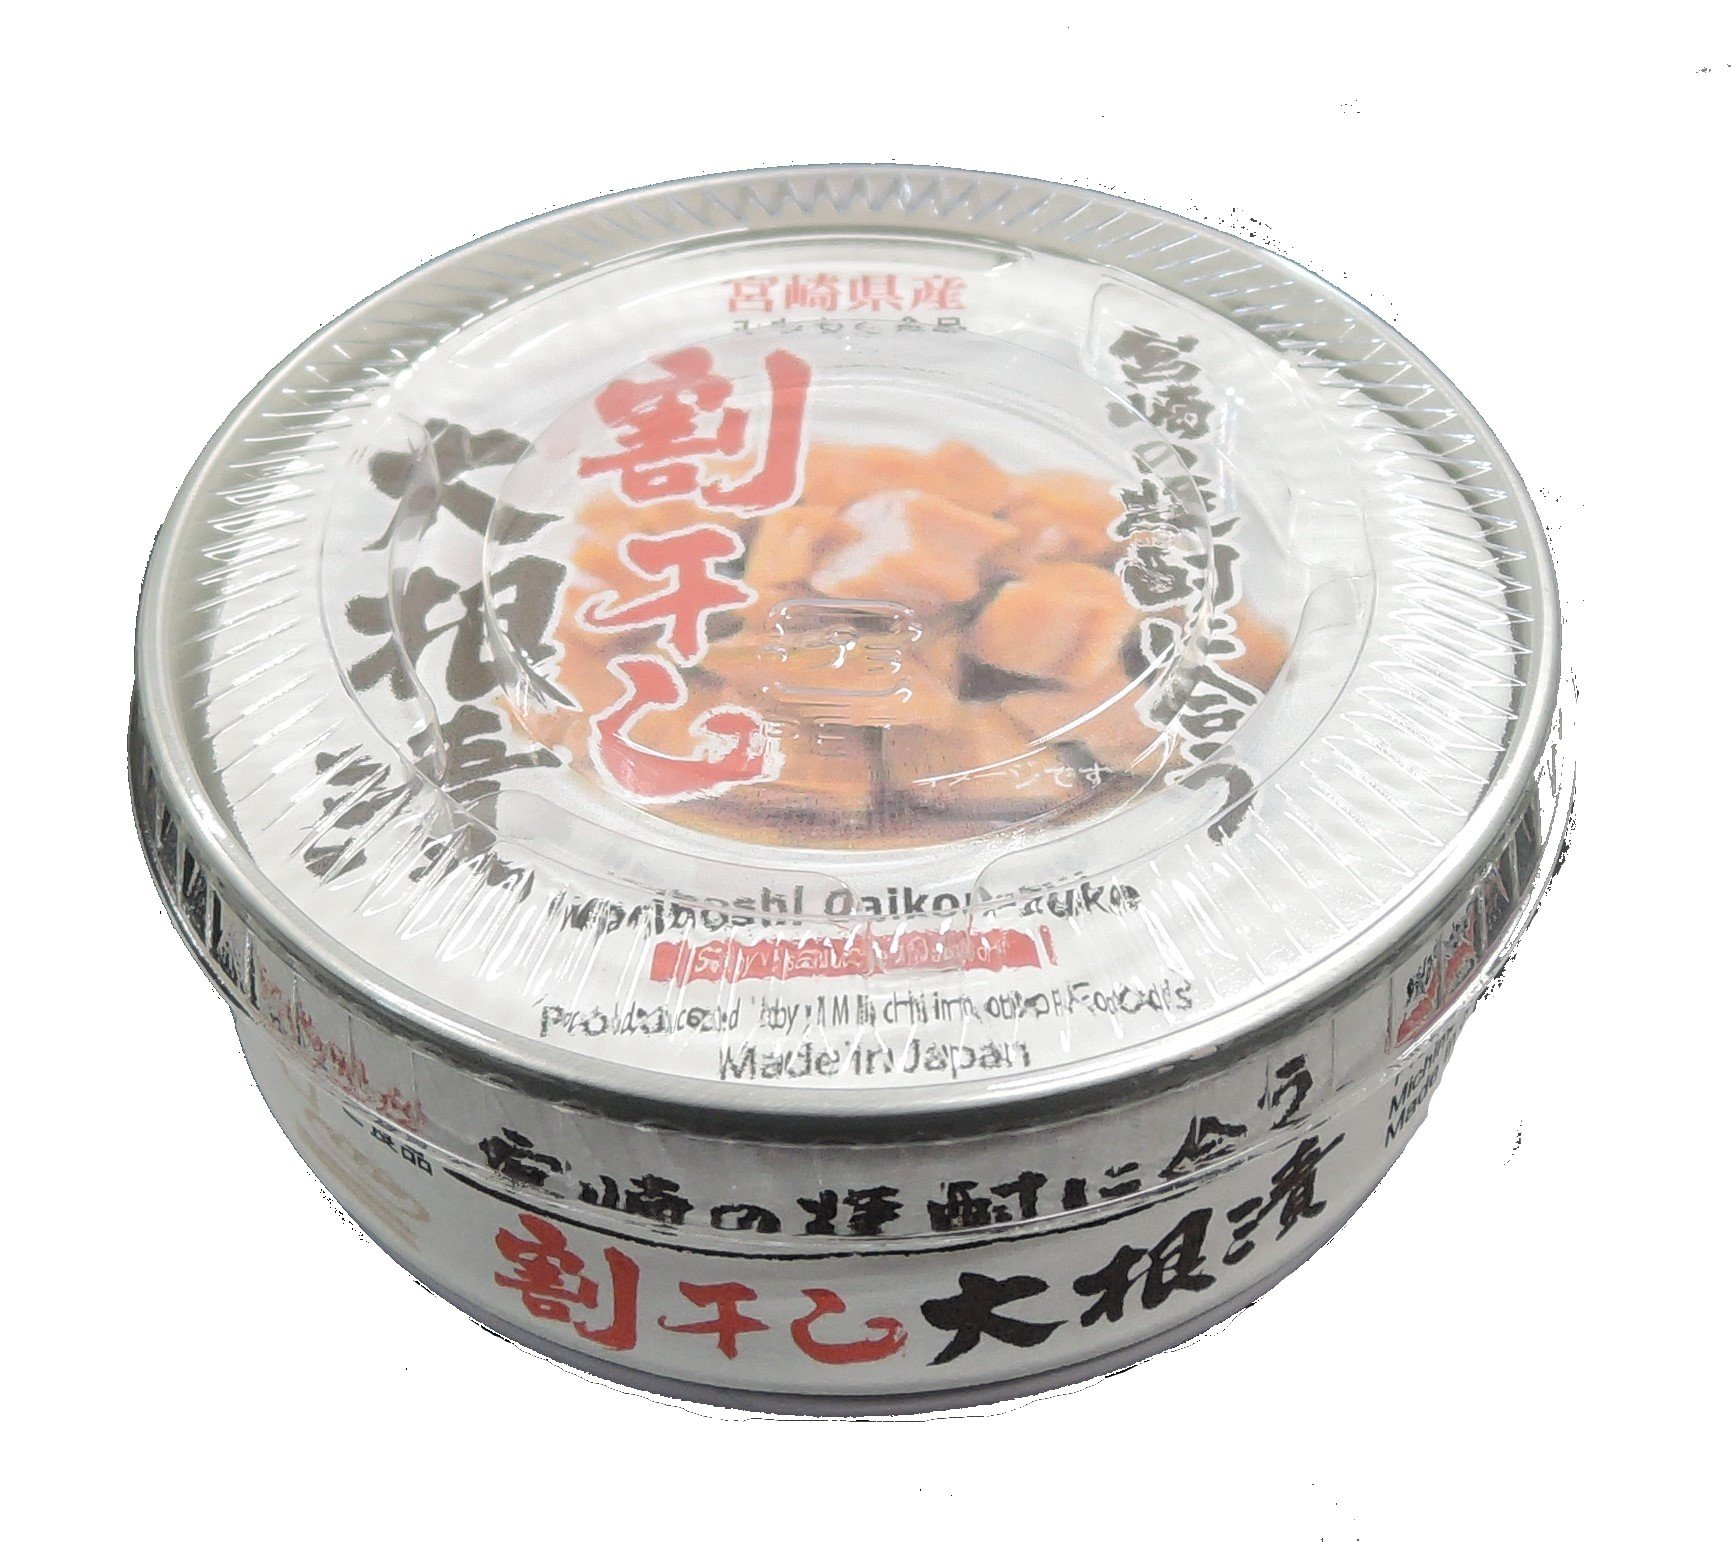 Dried radish pickles 70gX8 pieces spite of fit in Dohon food Miyazaki shochu